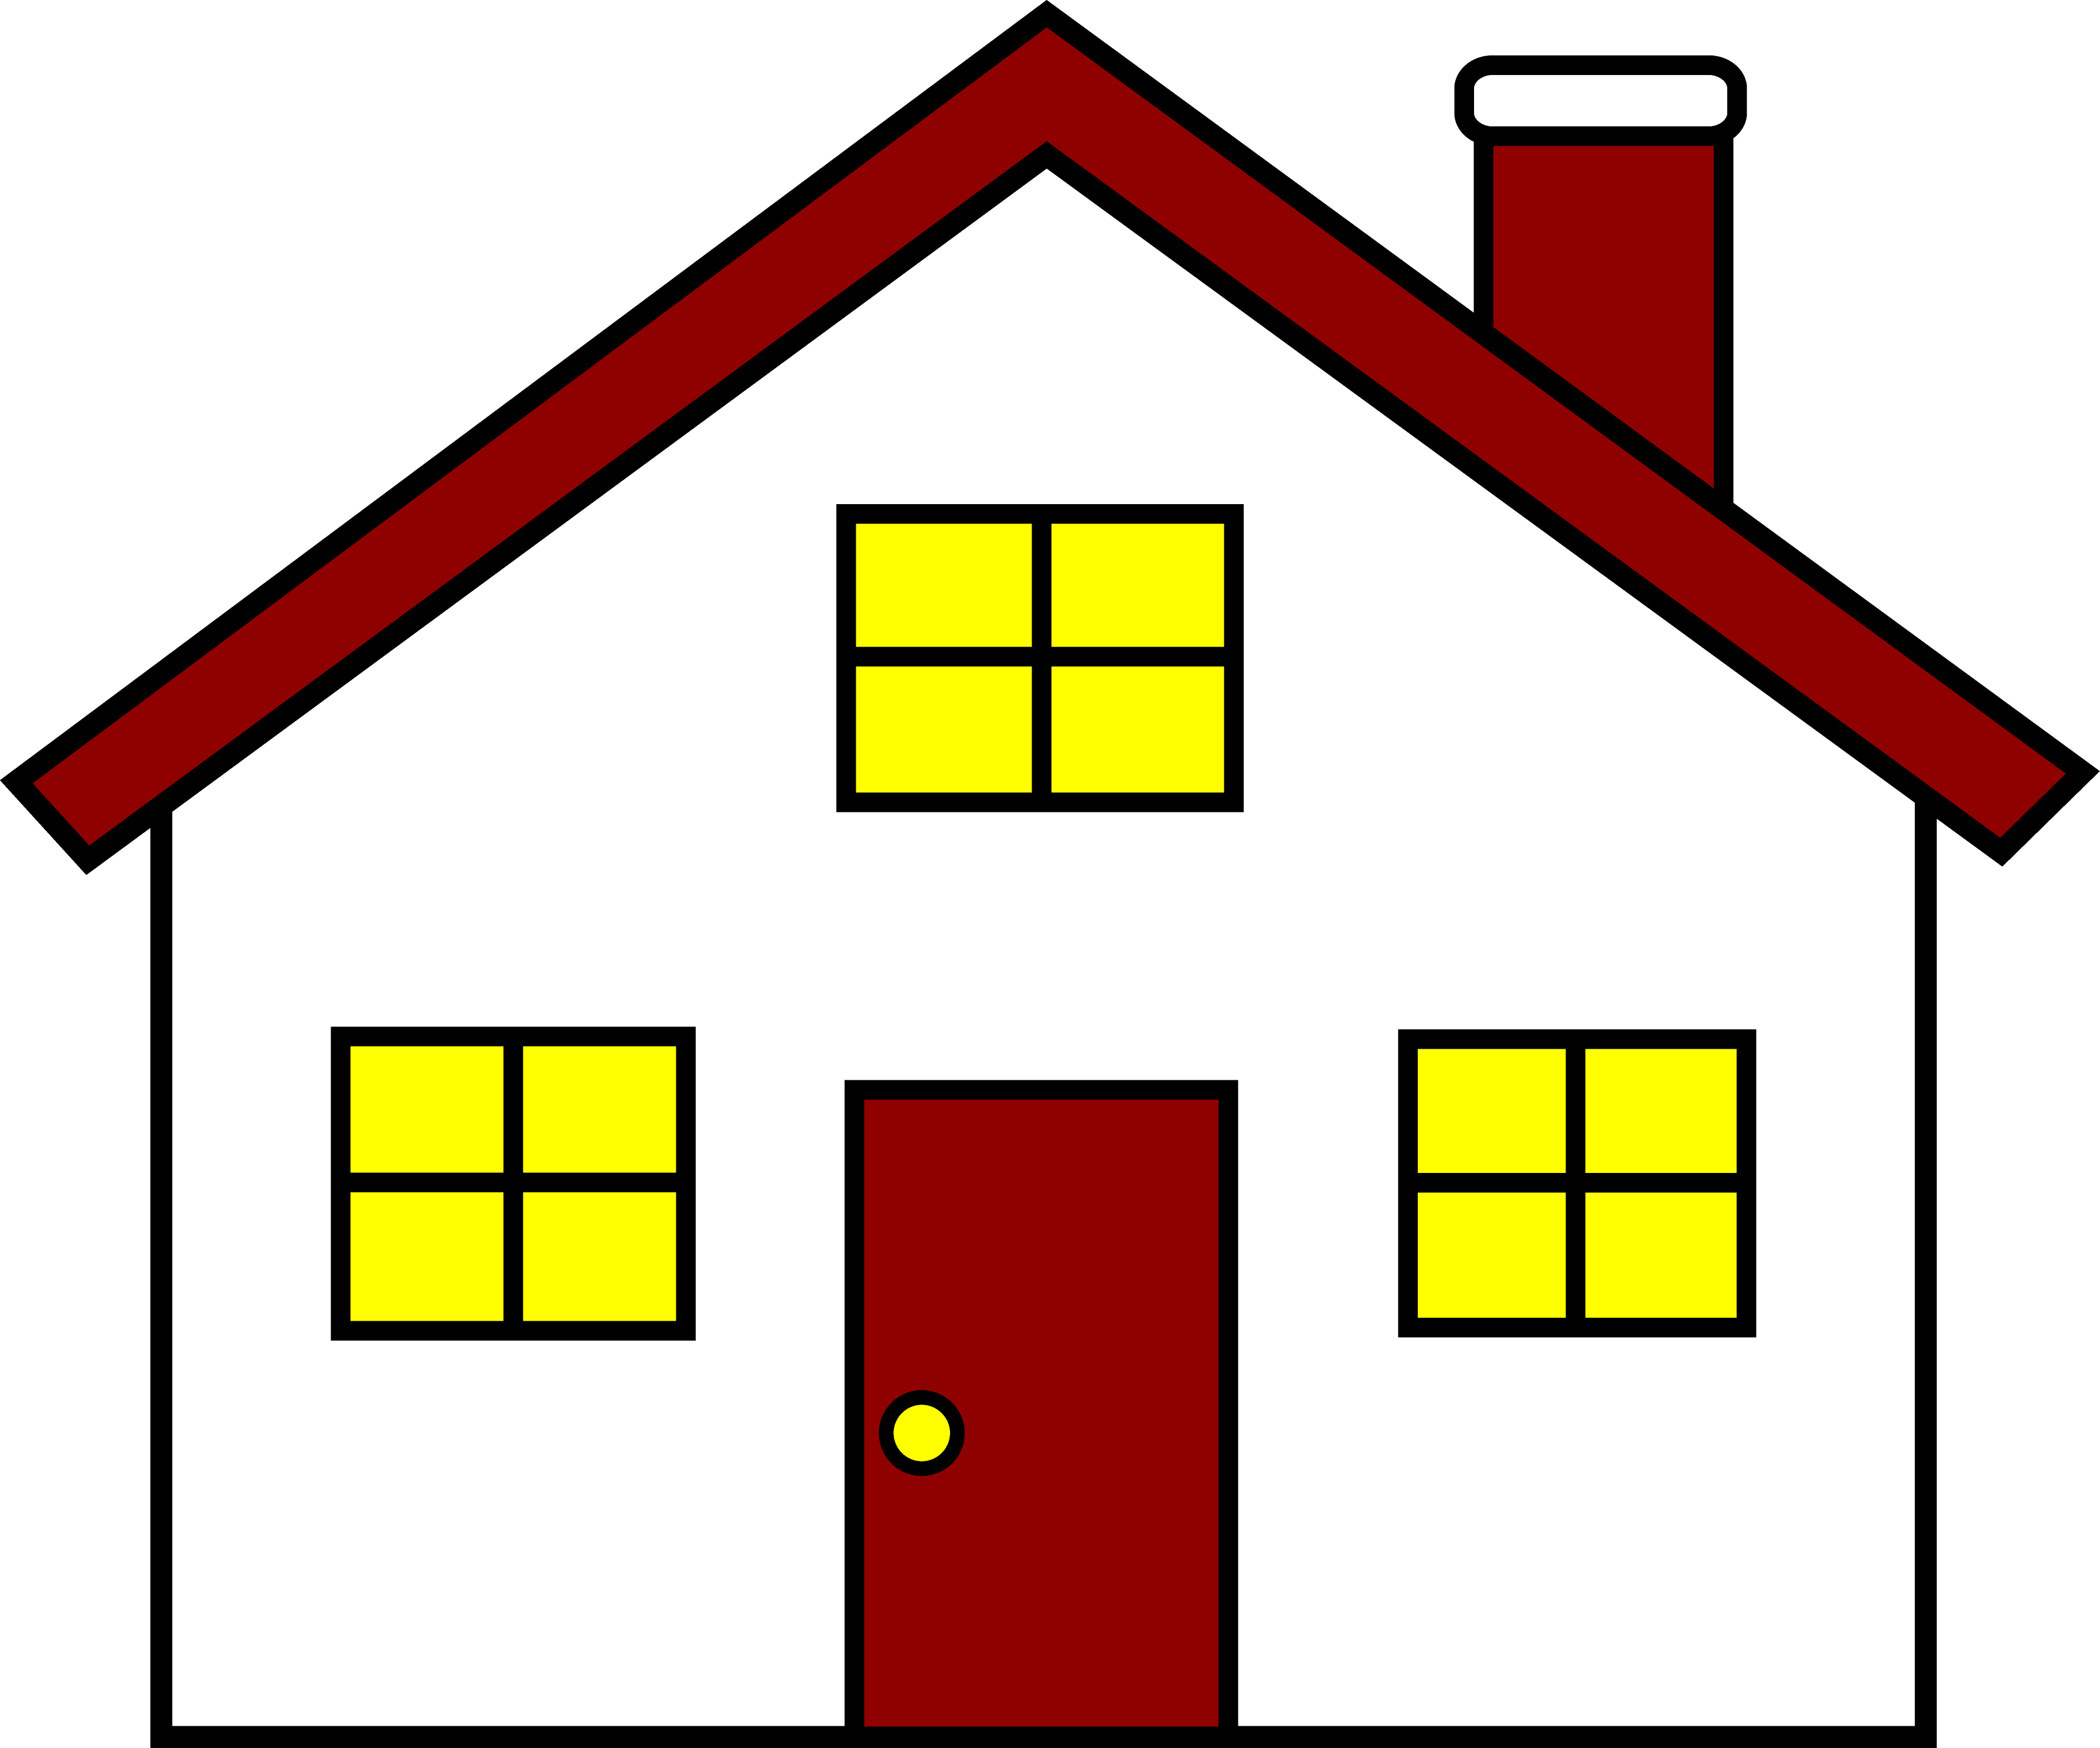 House clipart. Clip art free cartoon